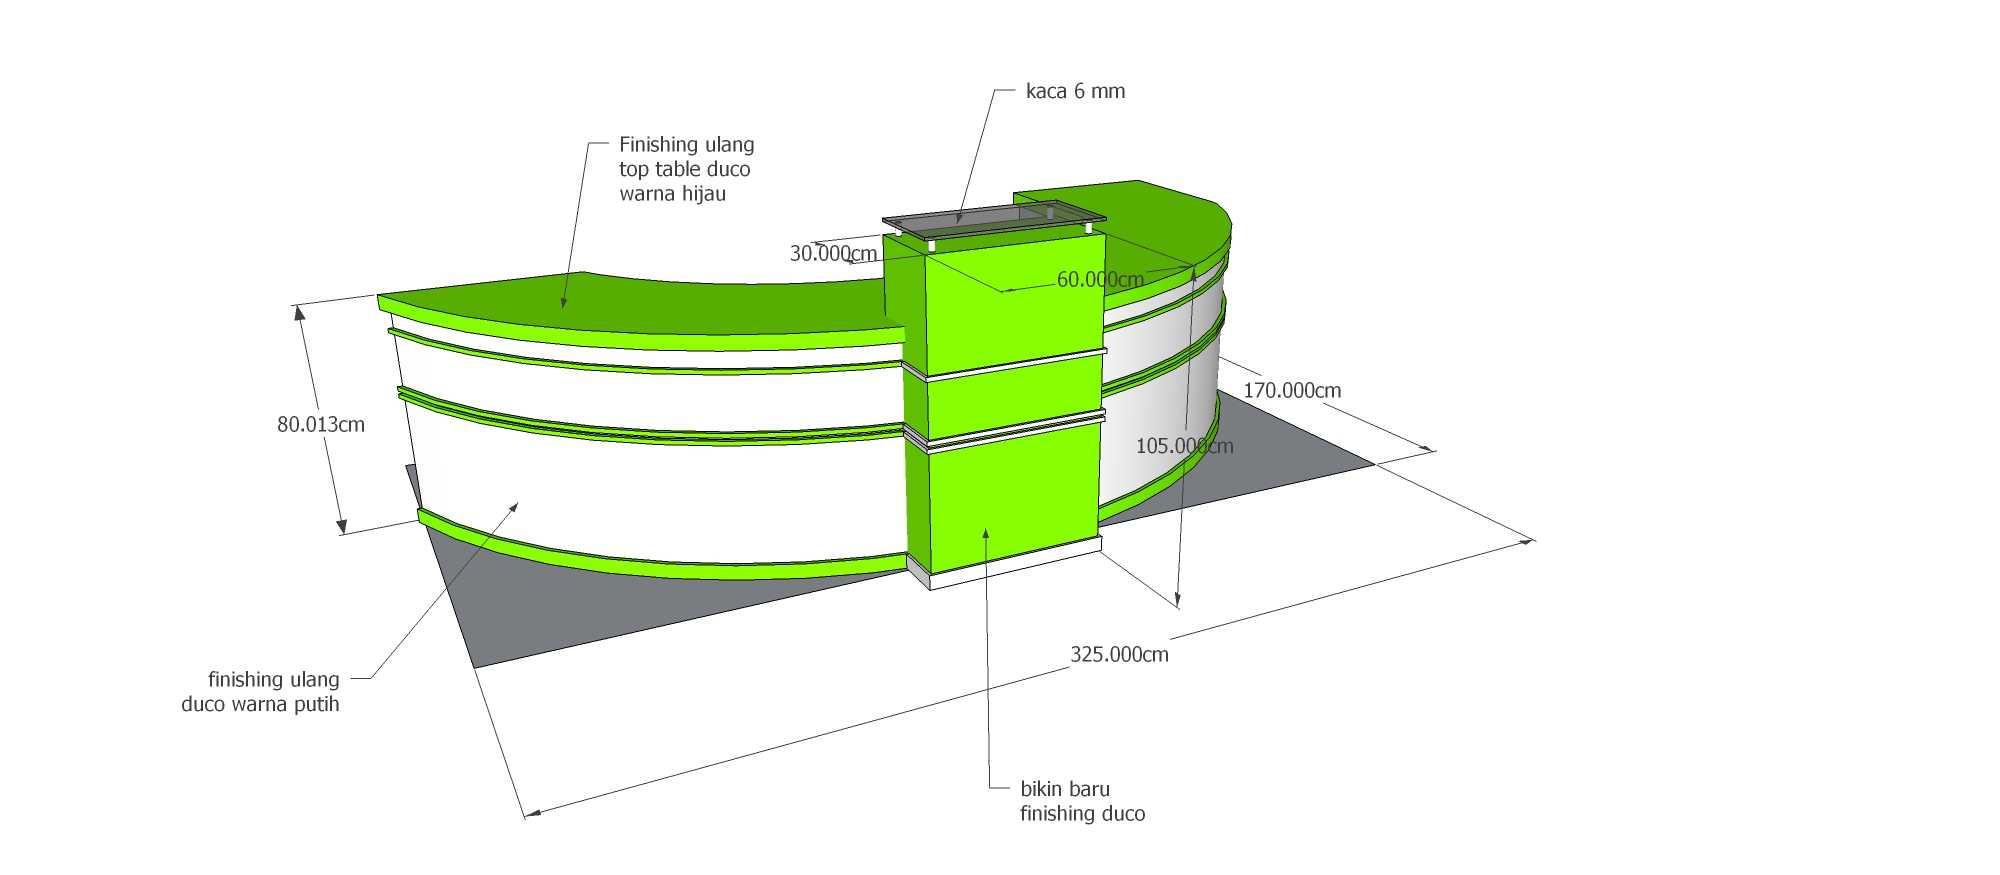 4Linked Architect Refinish Furniture Surabaya, Kota Sby, Jawa Timur, Indonesia Surabaya, Kota Sby, Jawa Timur, Indonesia 4Linked-Architect-Refinish-Furniture   75241